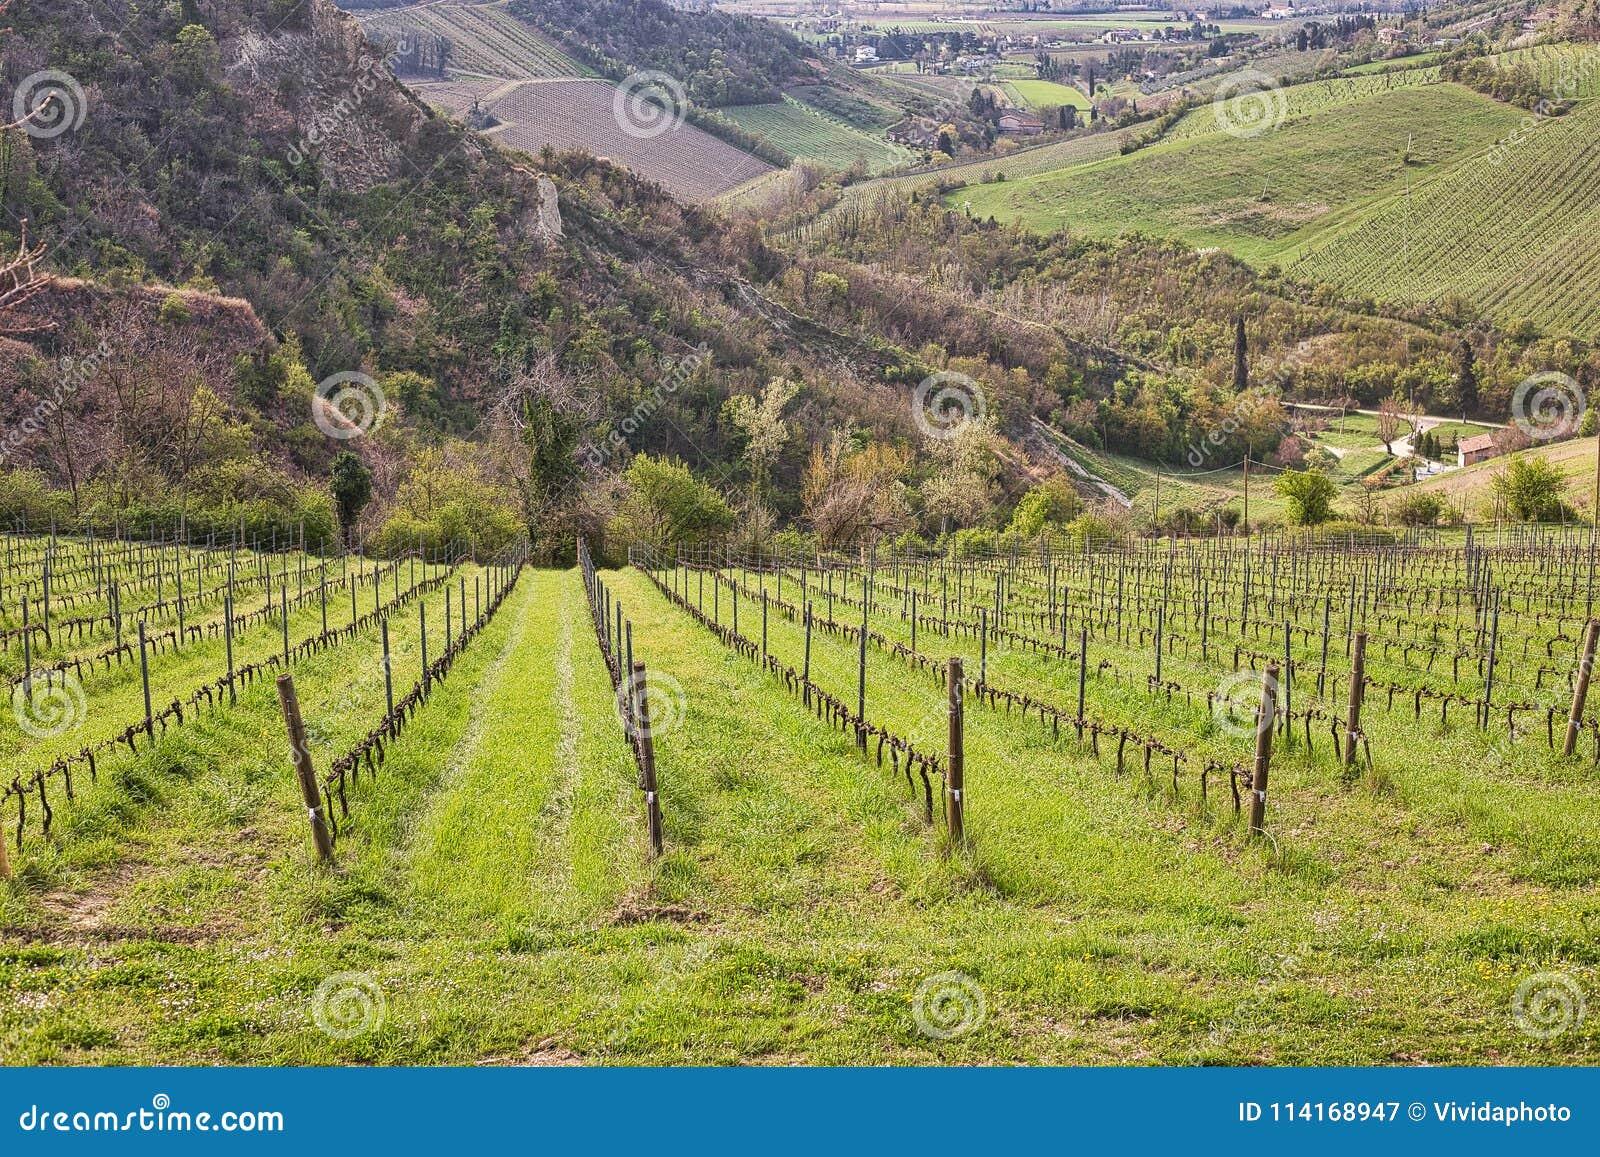 Green grass in vineyard fields